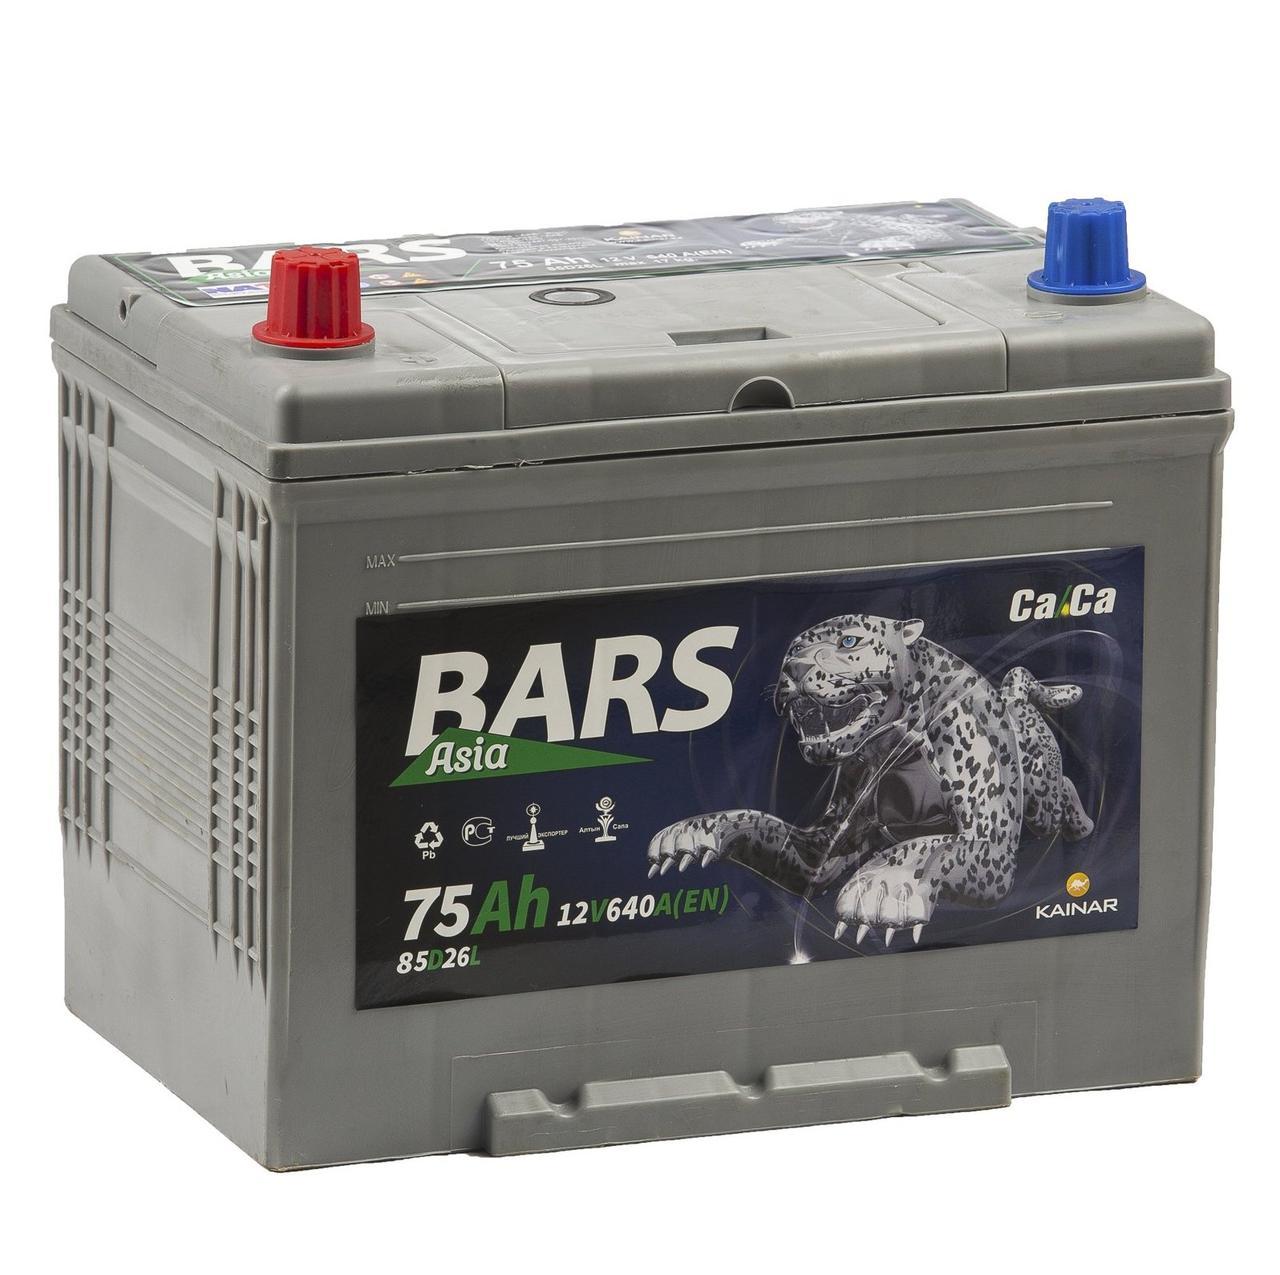 Аккумулятор Bars Asia 75Ah Jis (Высокий)